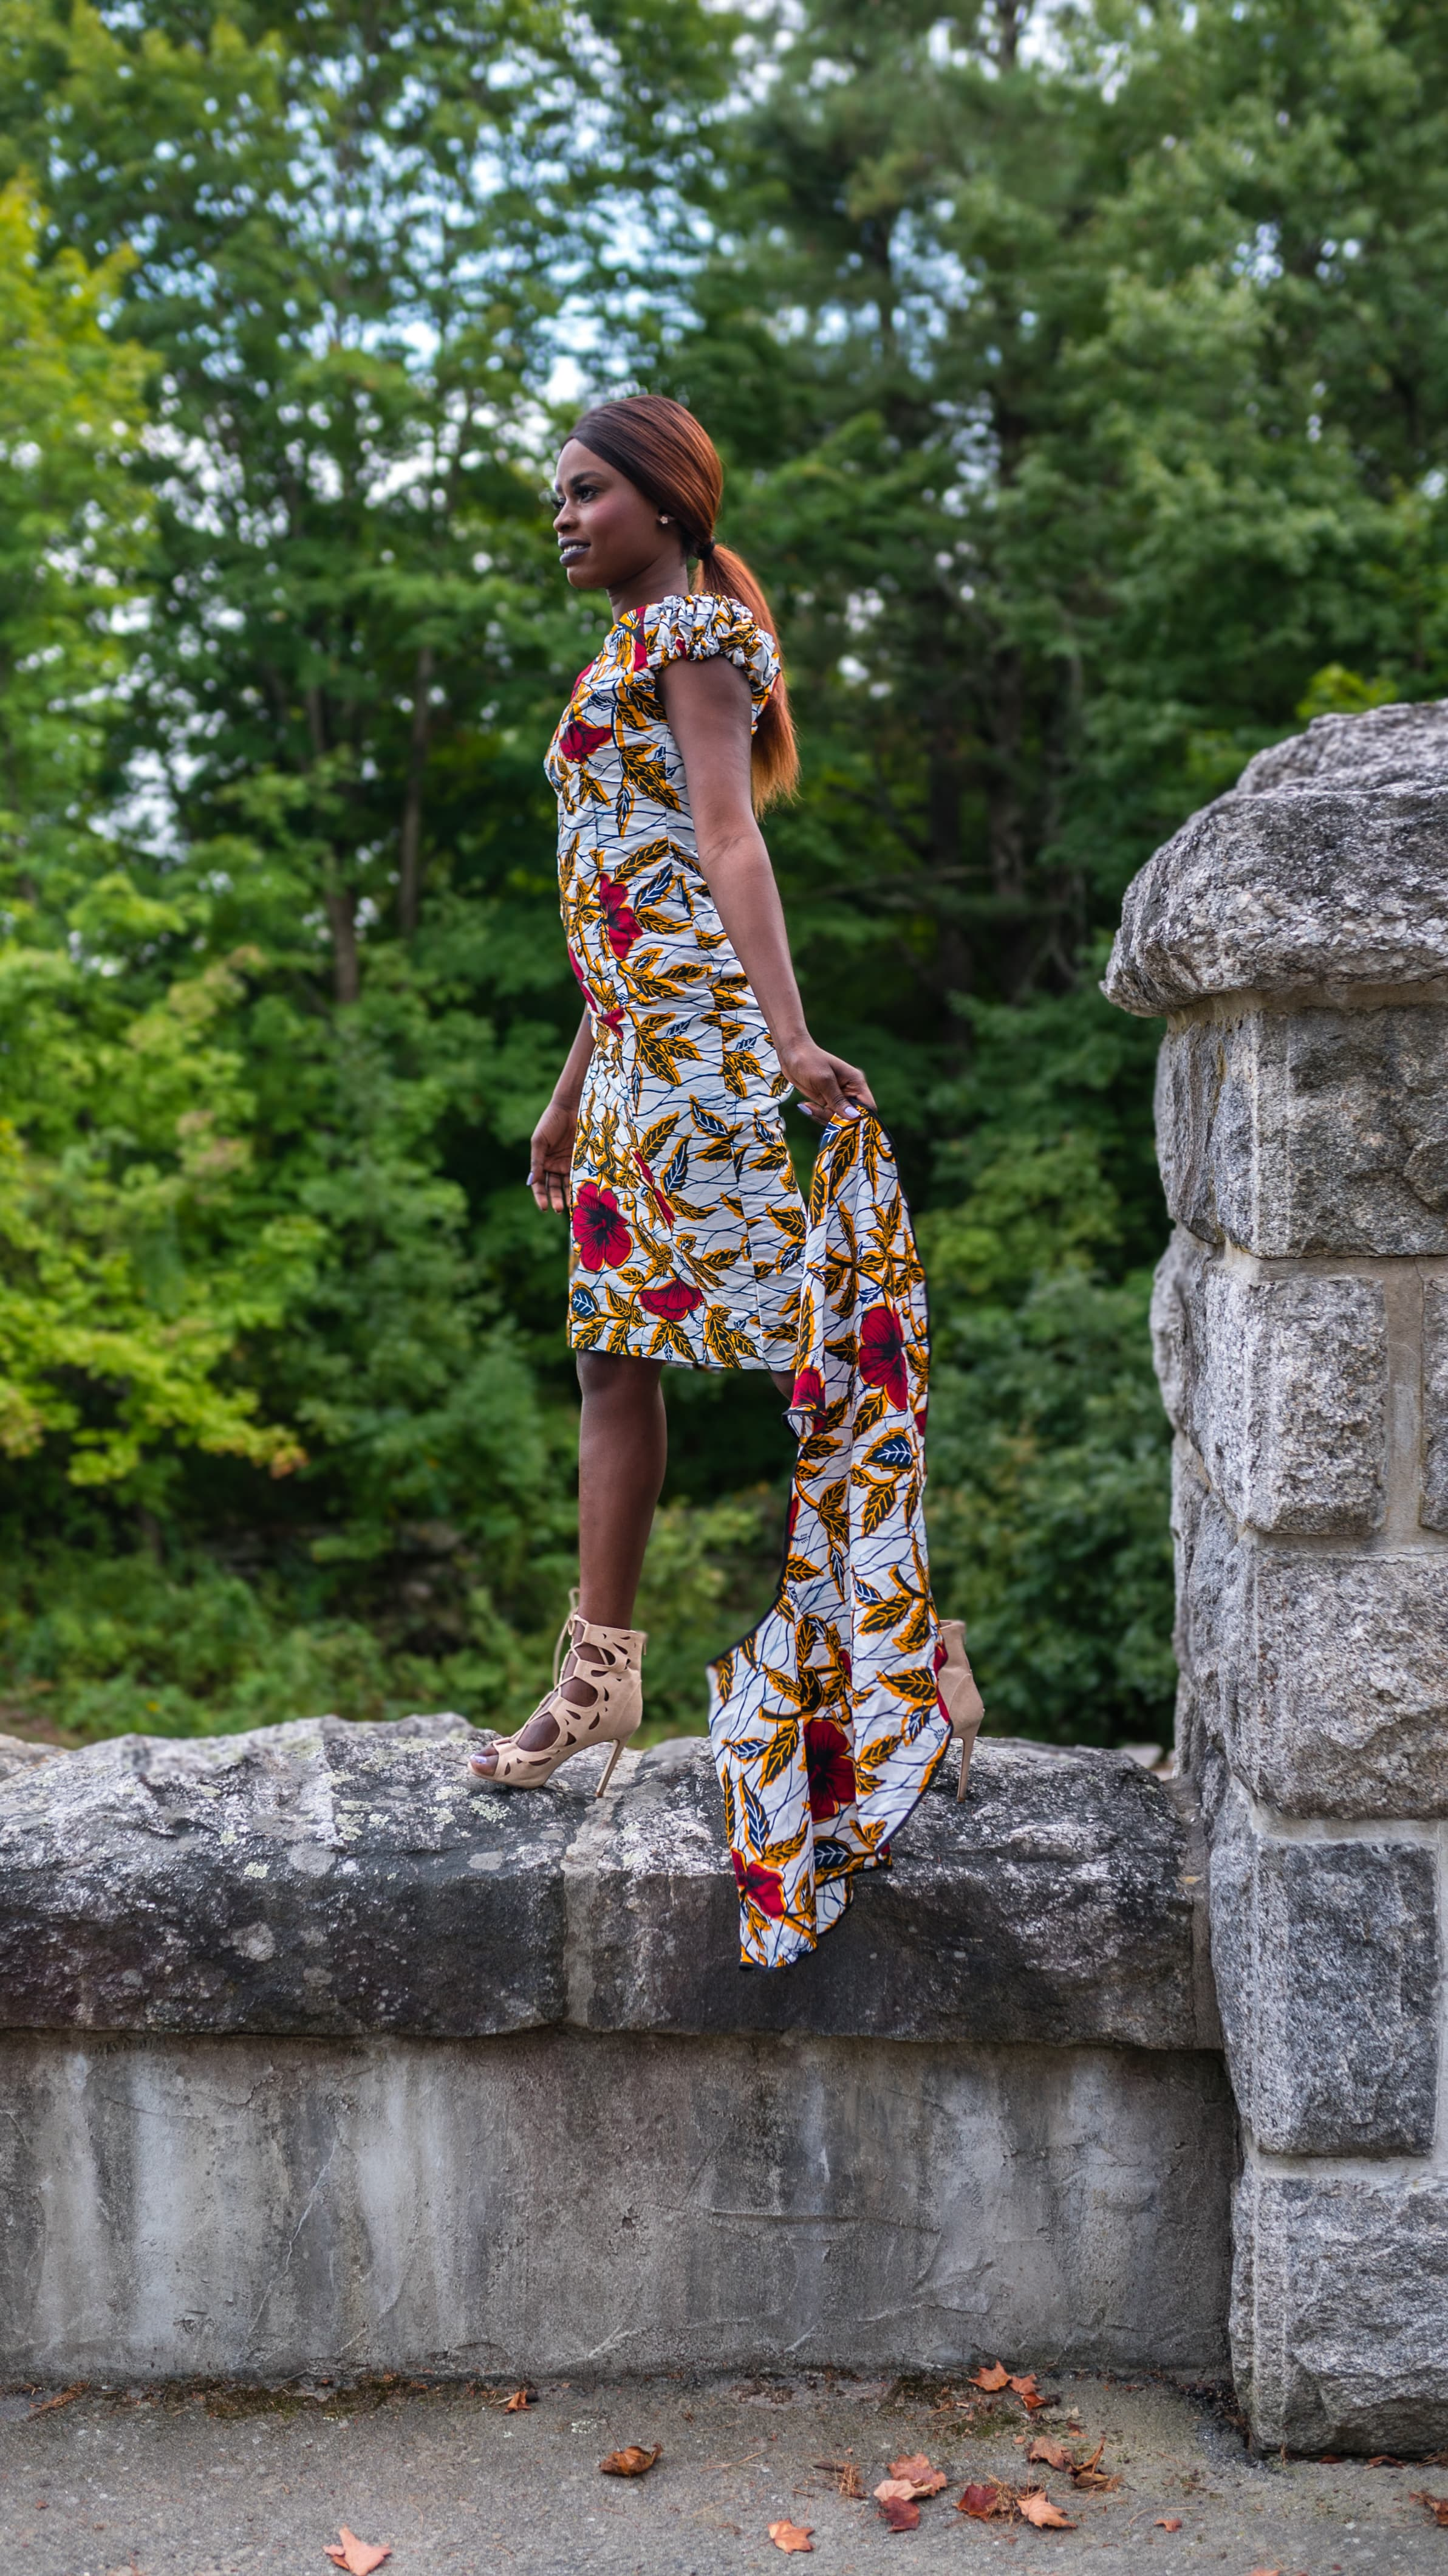 VinnyMwano_Fashion Editorial 7-min.jpg